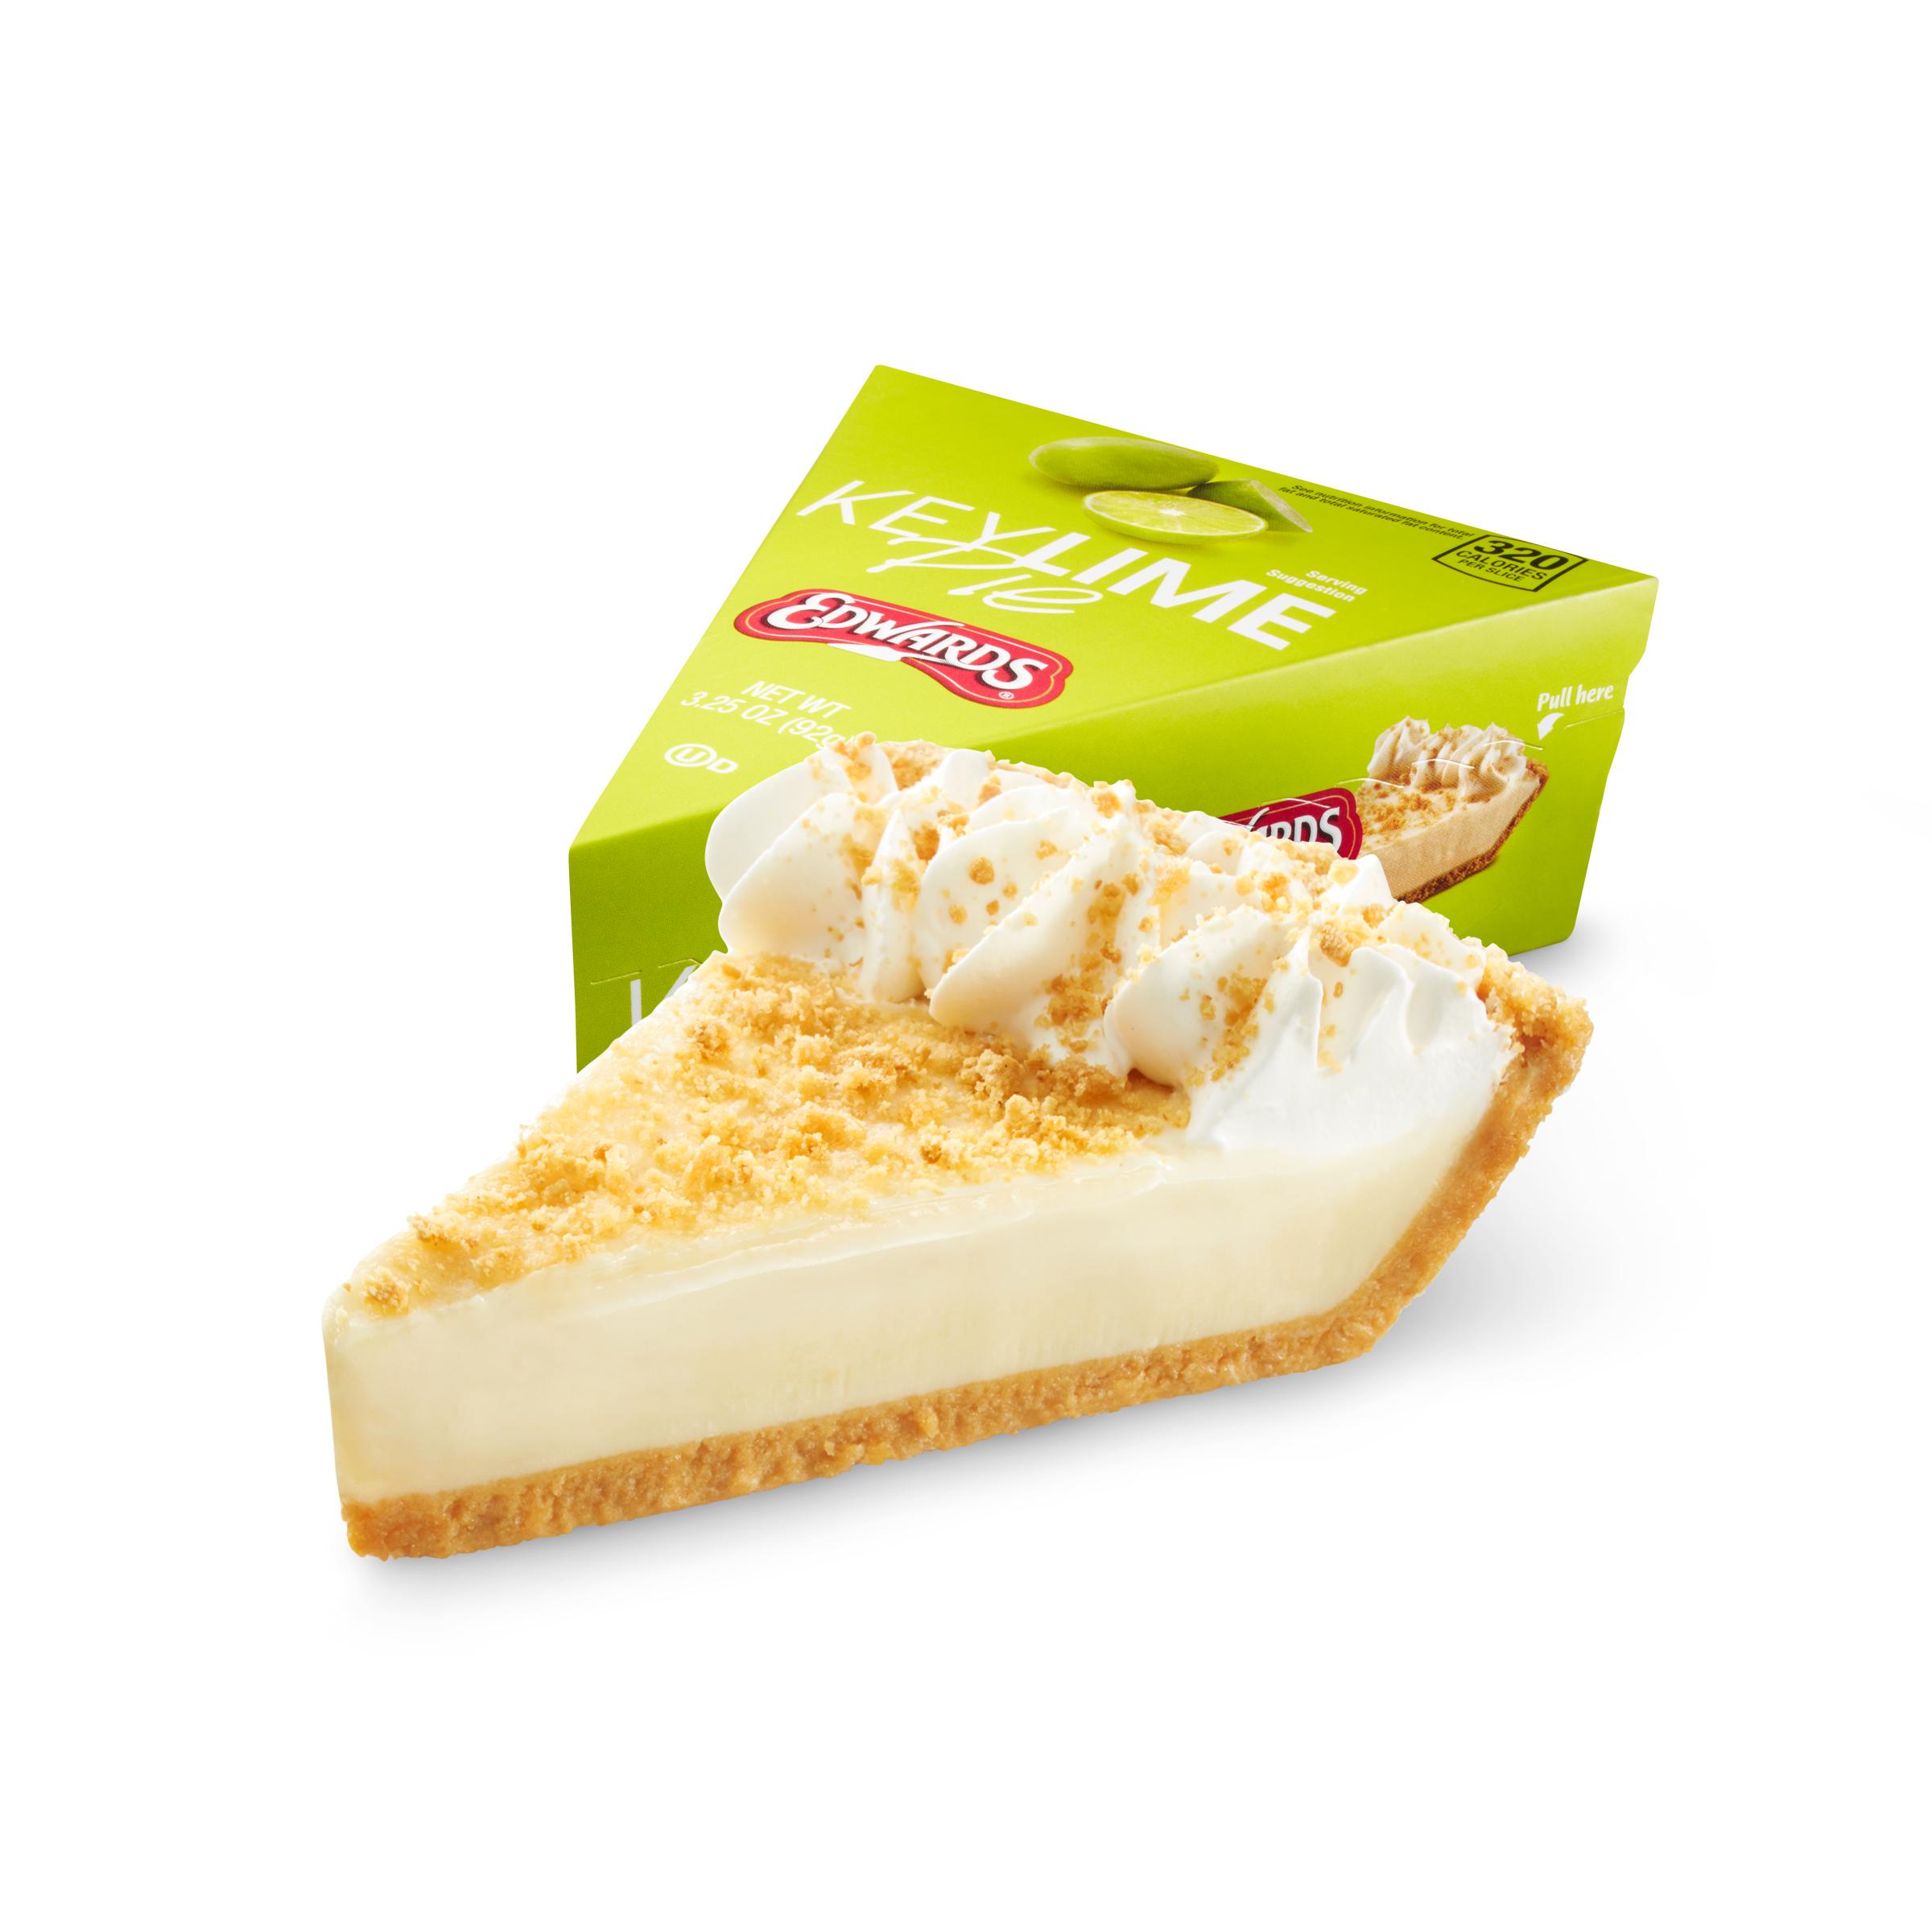 edwards_singles_key_lime_creme_pie_iw-70768